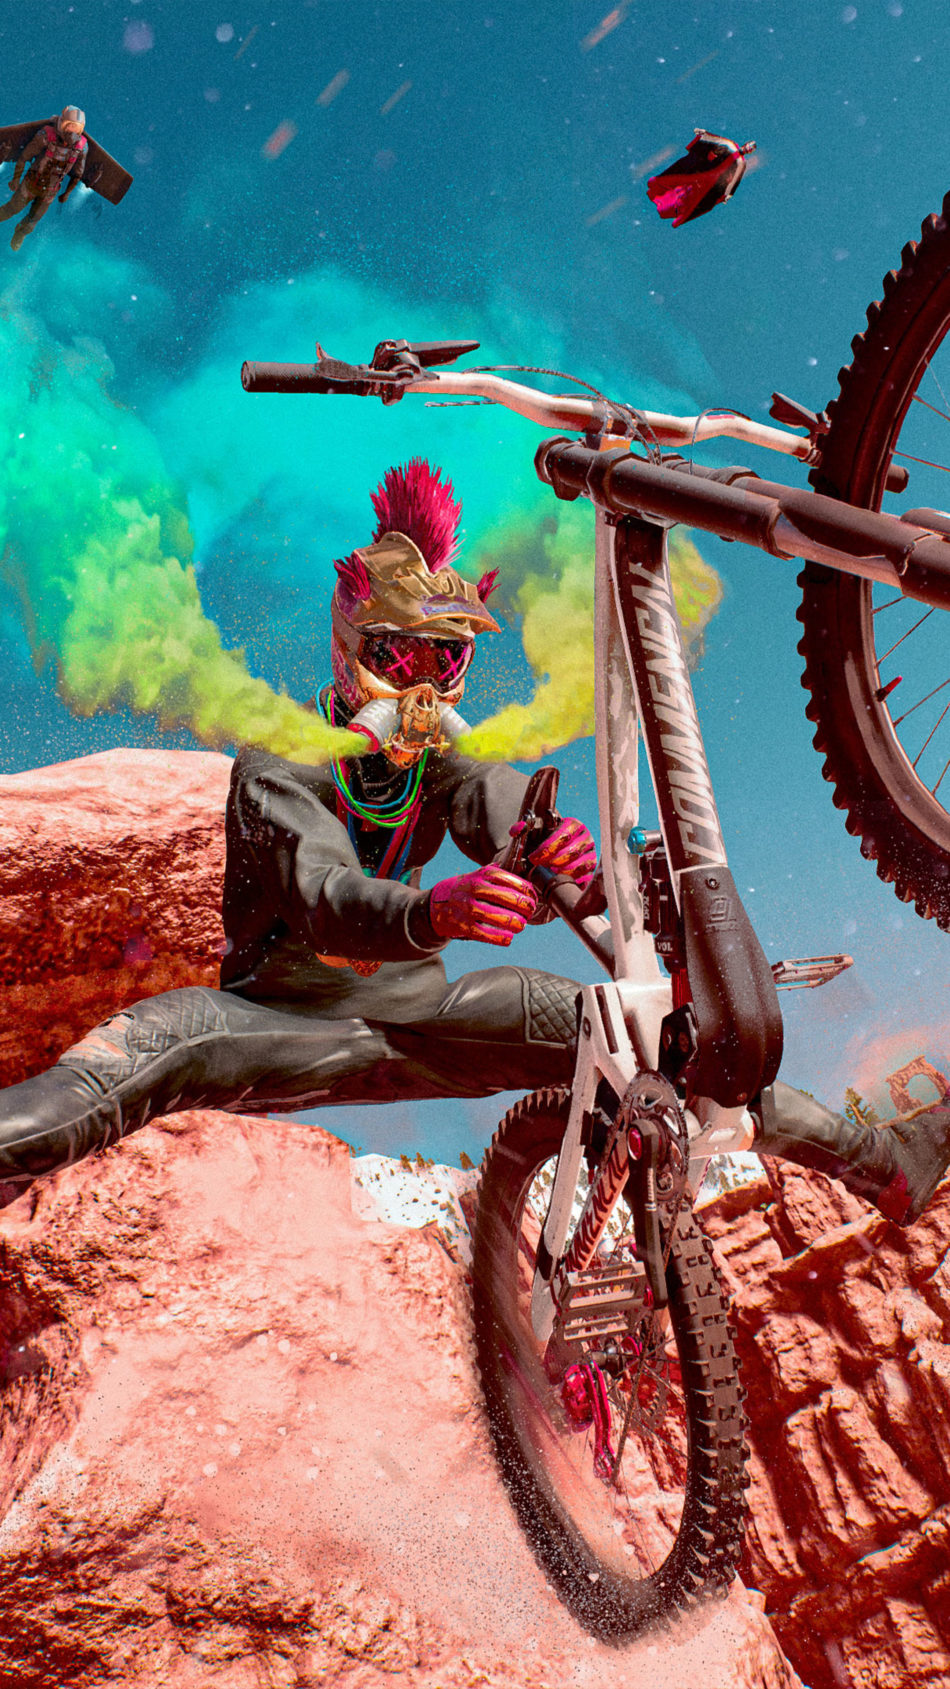 Riders Republic Game 4K Ultra HD Mobile Wallpaper